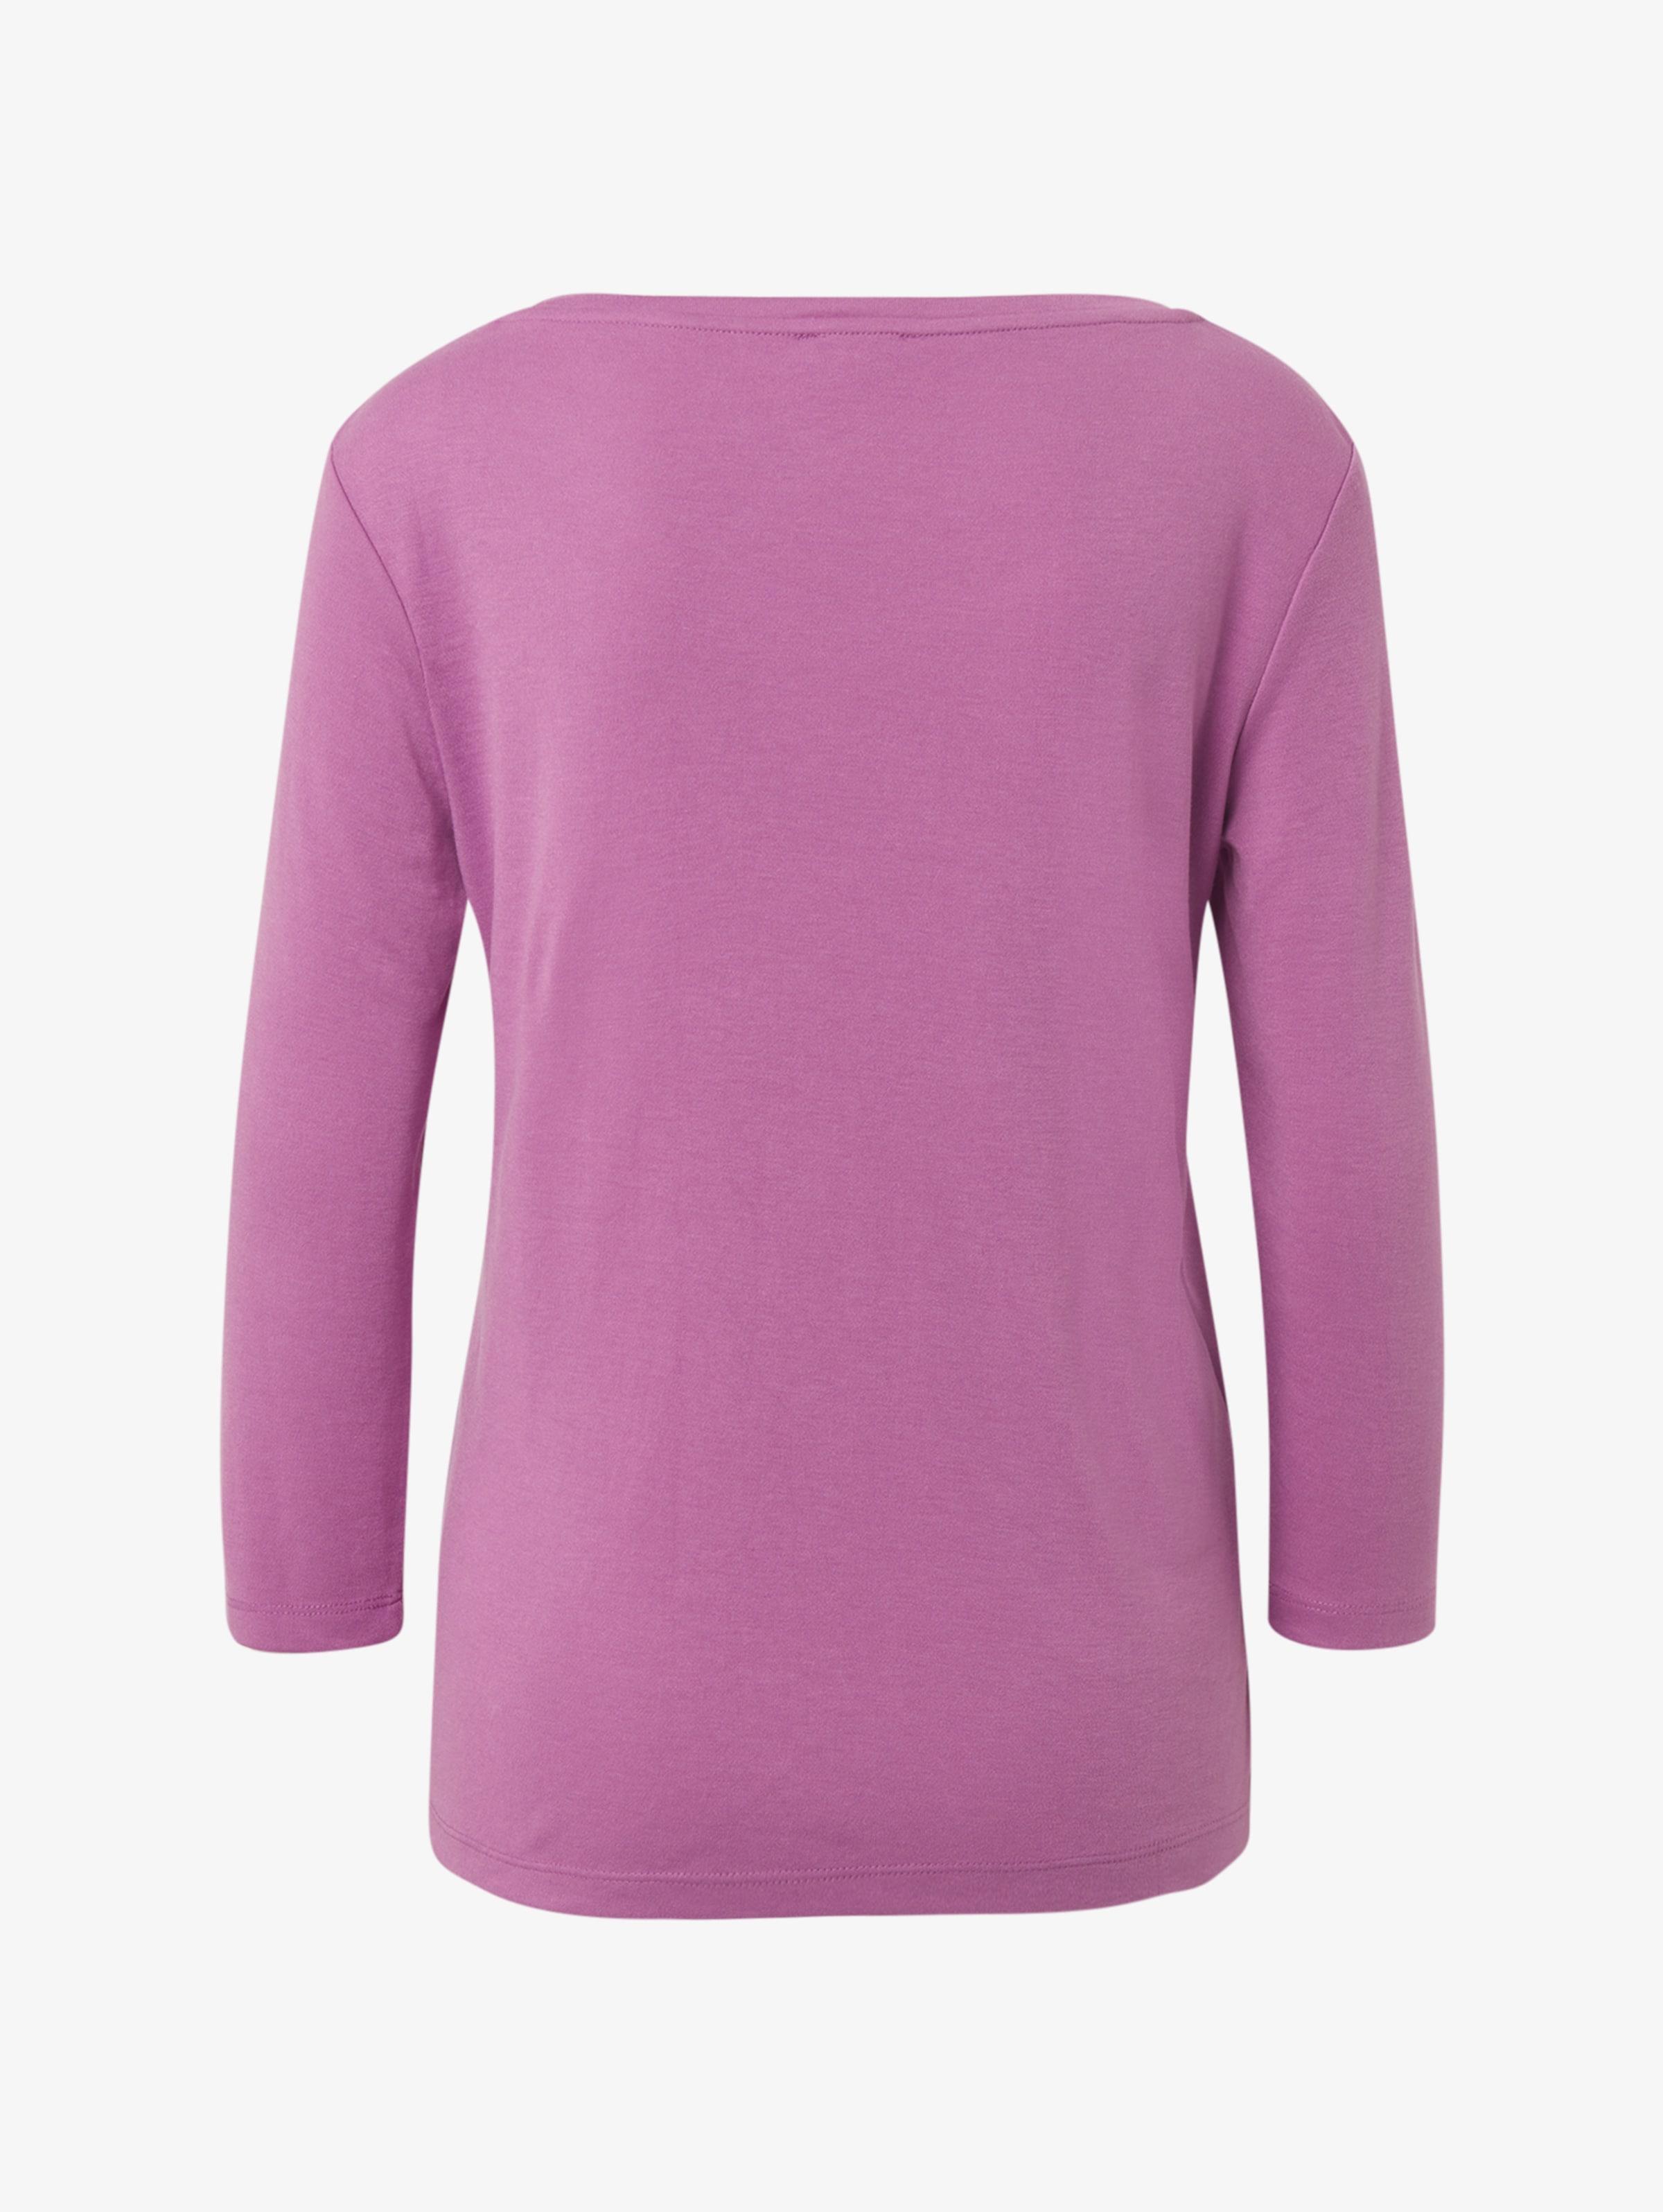 T Helllila shirt Tom In Tailor CrxtQshd